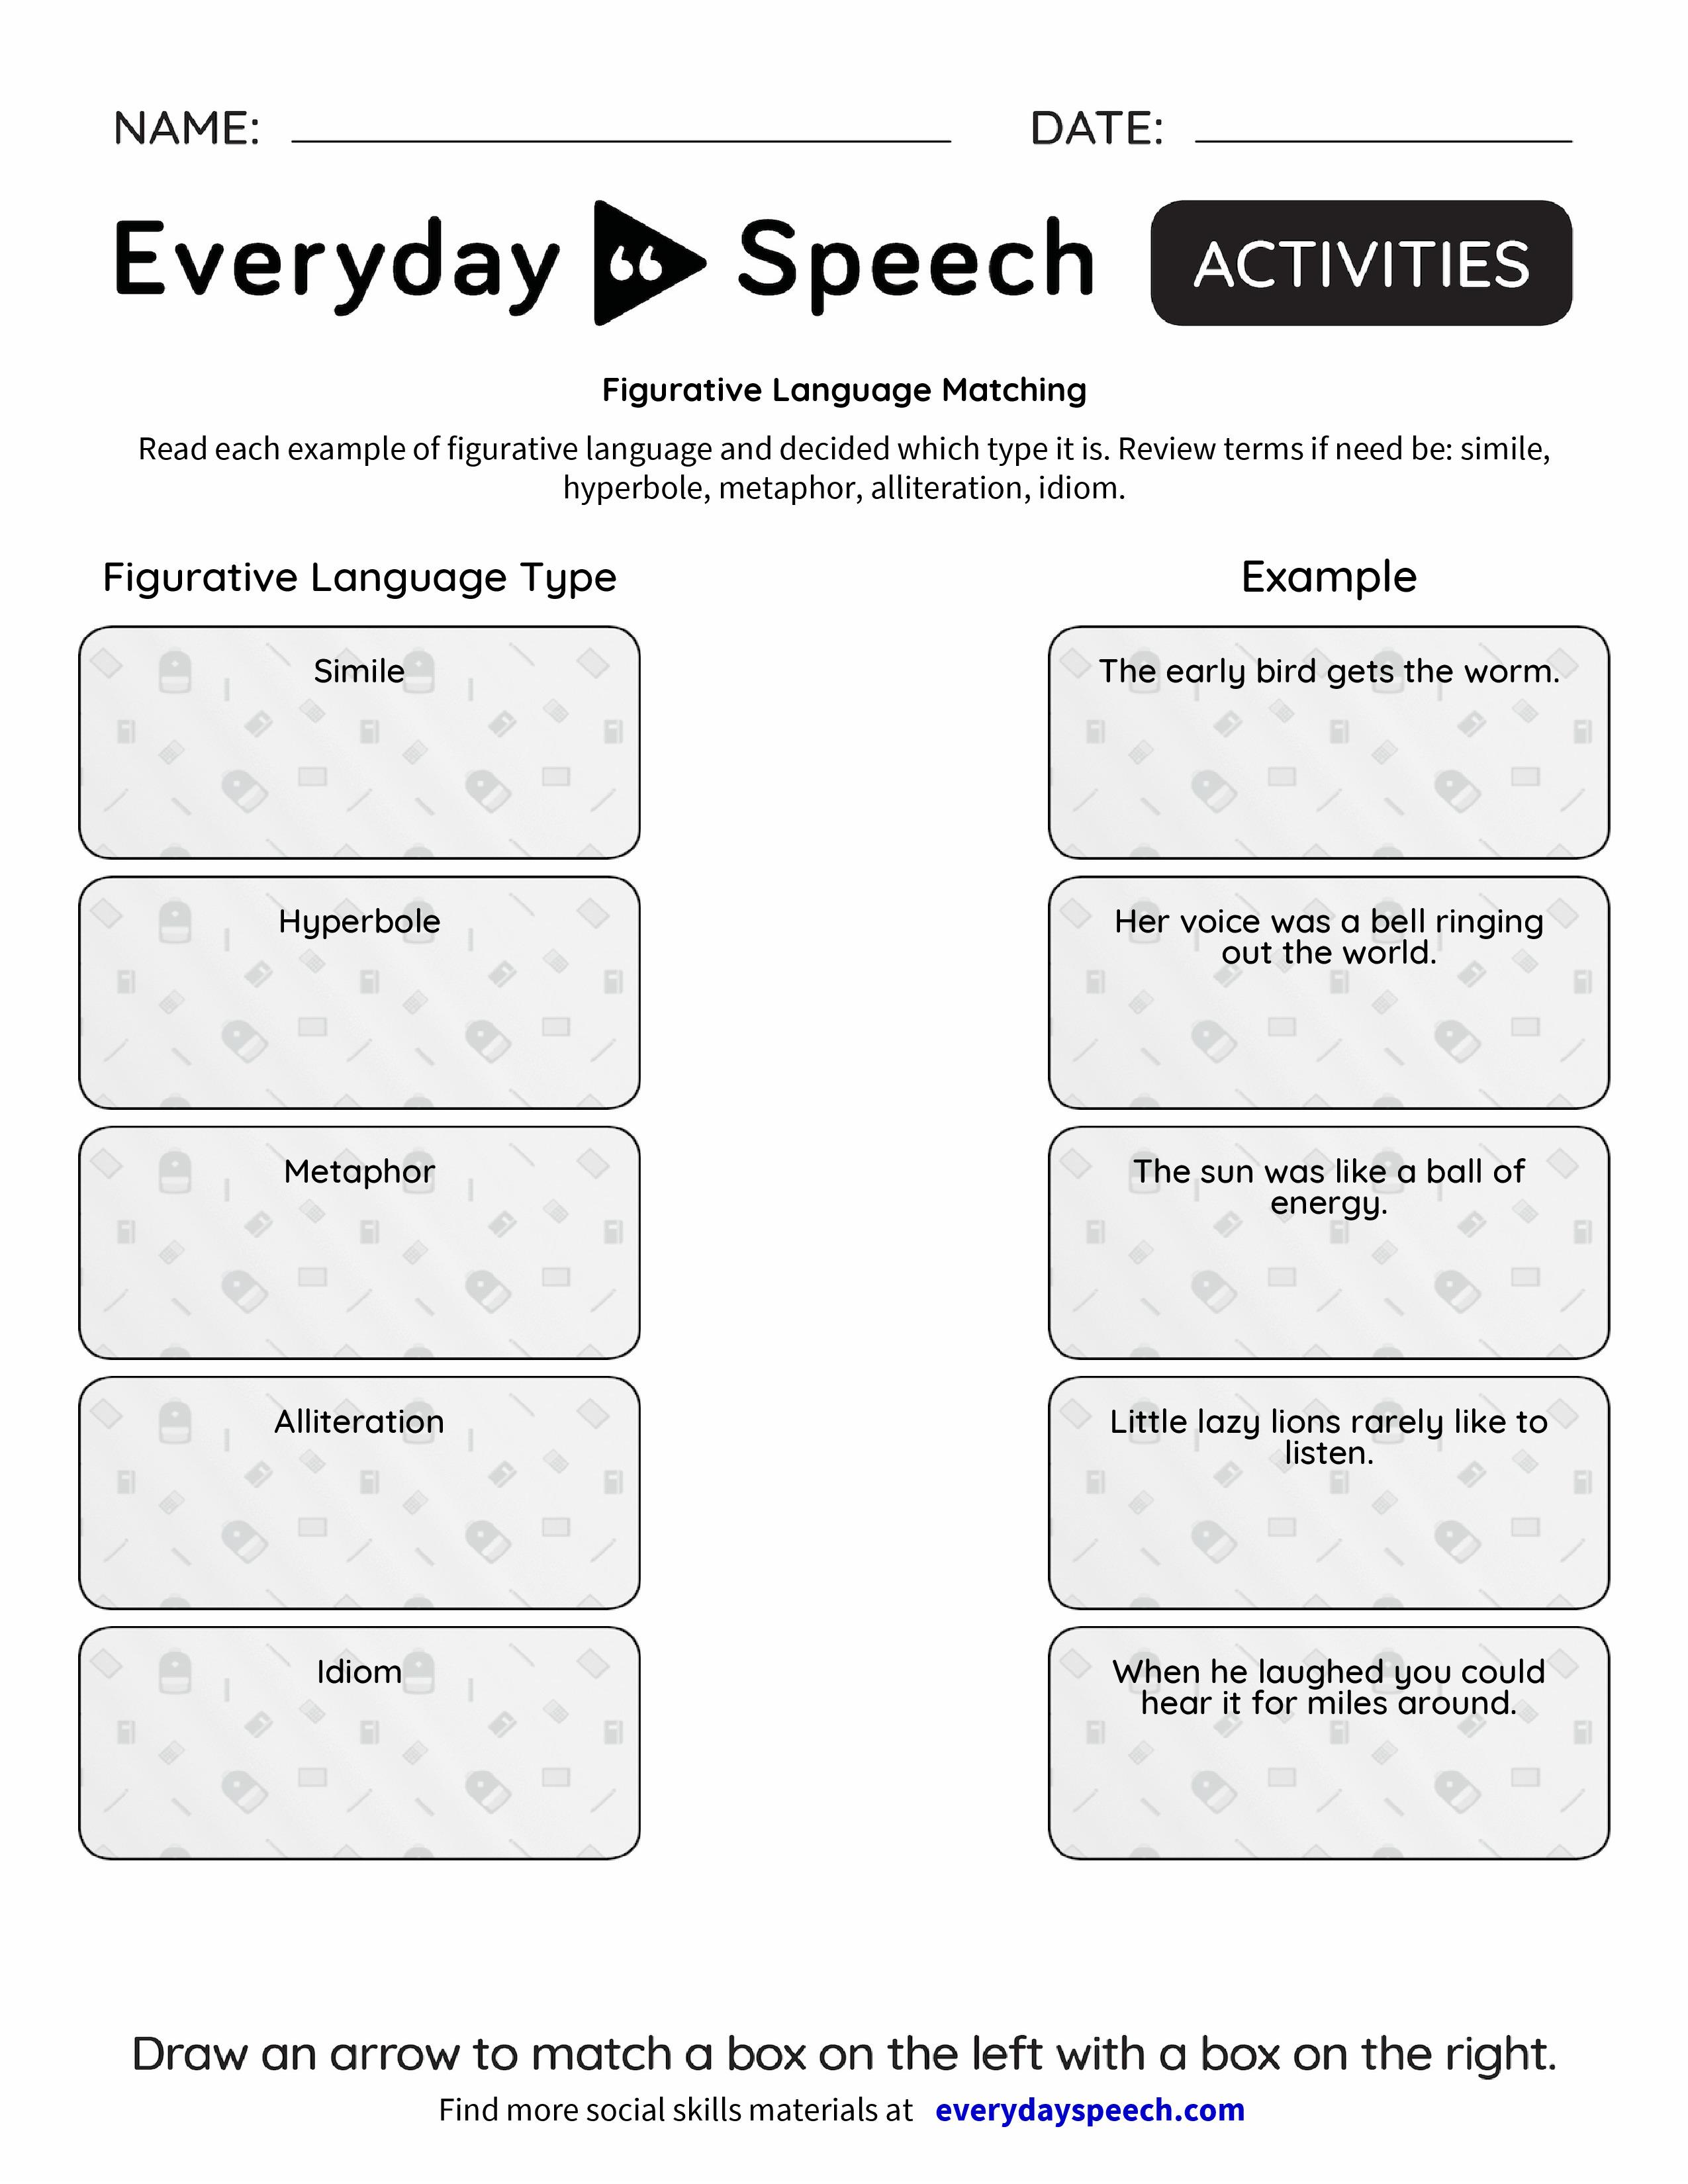 Figurative Language Matching Everyday Speech Everyday Speech – Figurative Language Review Worksheet